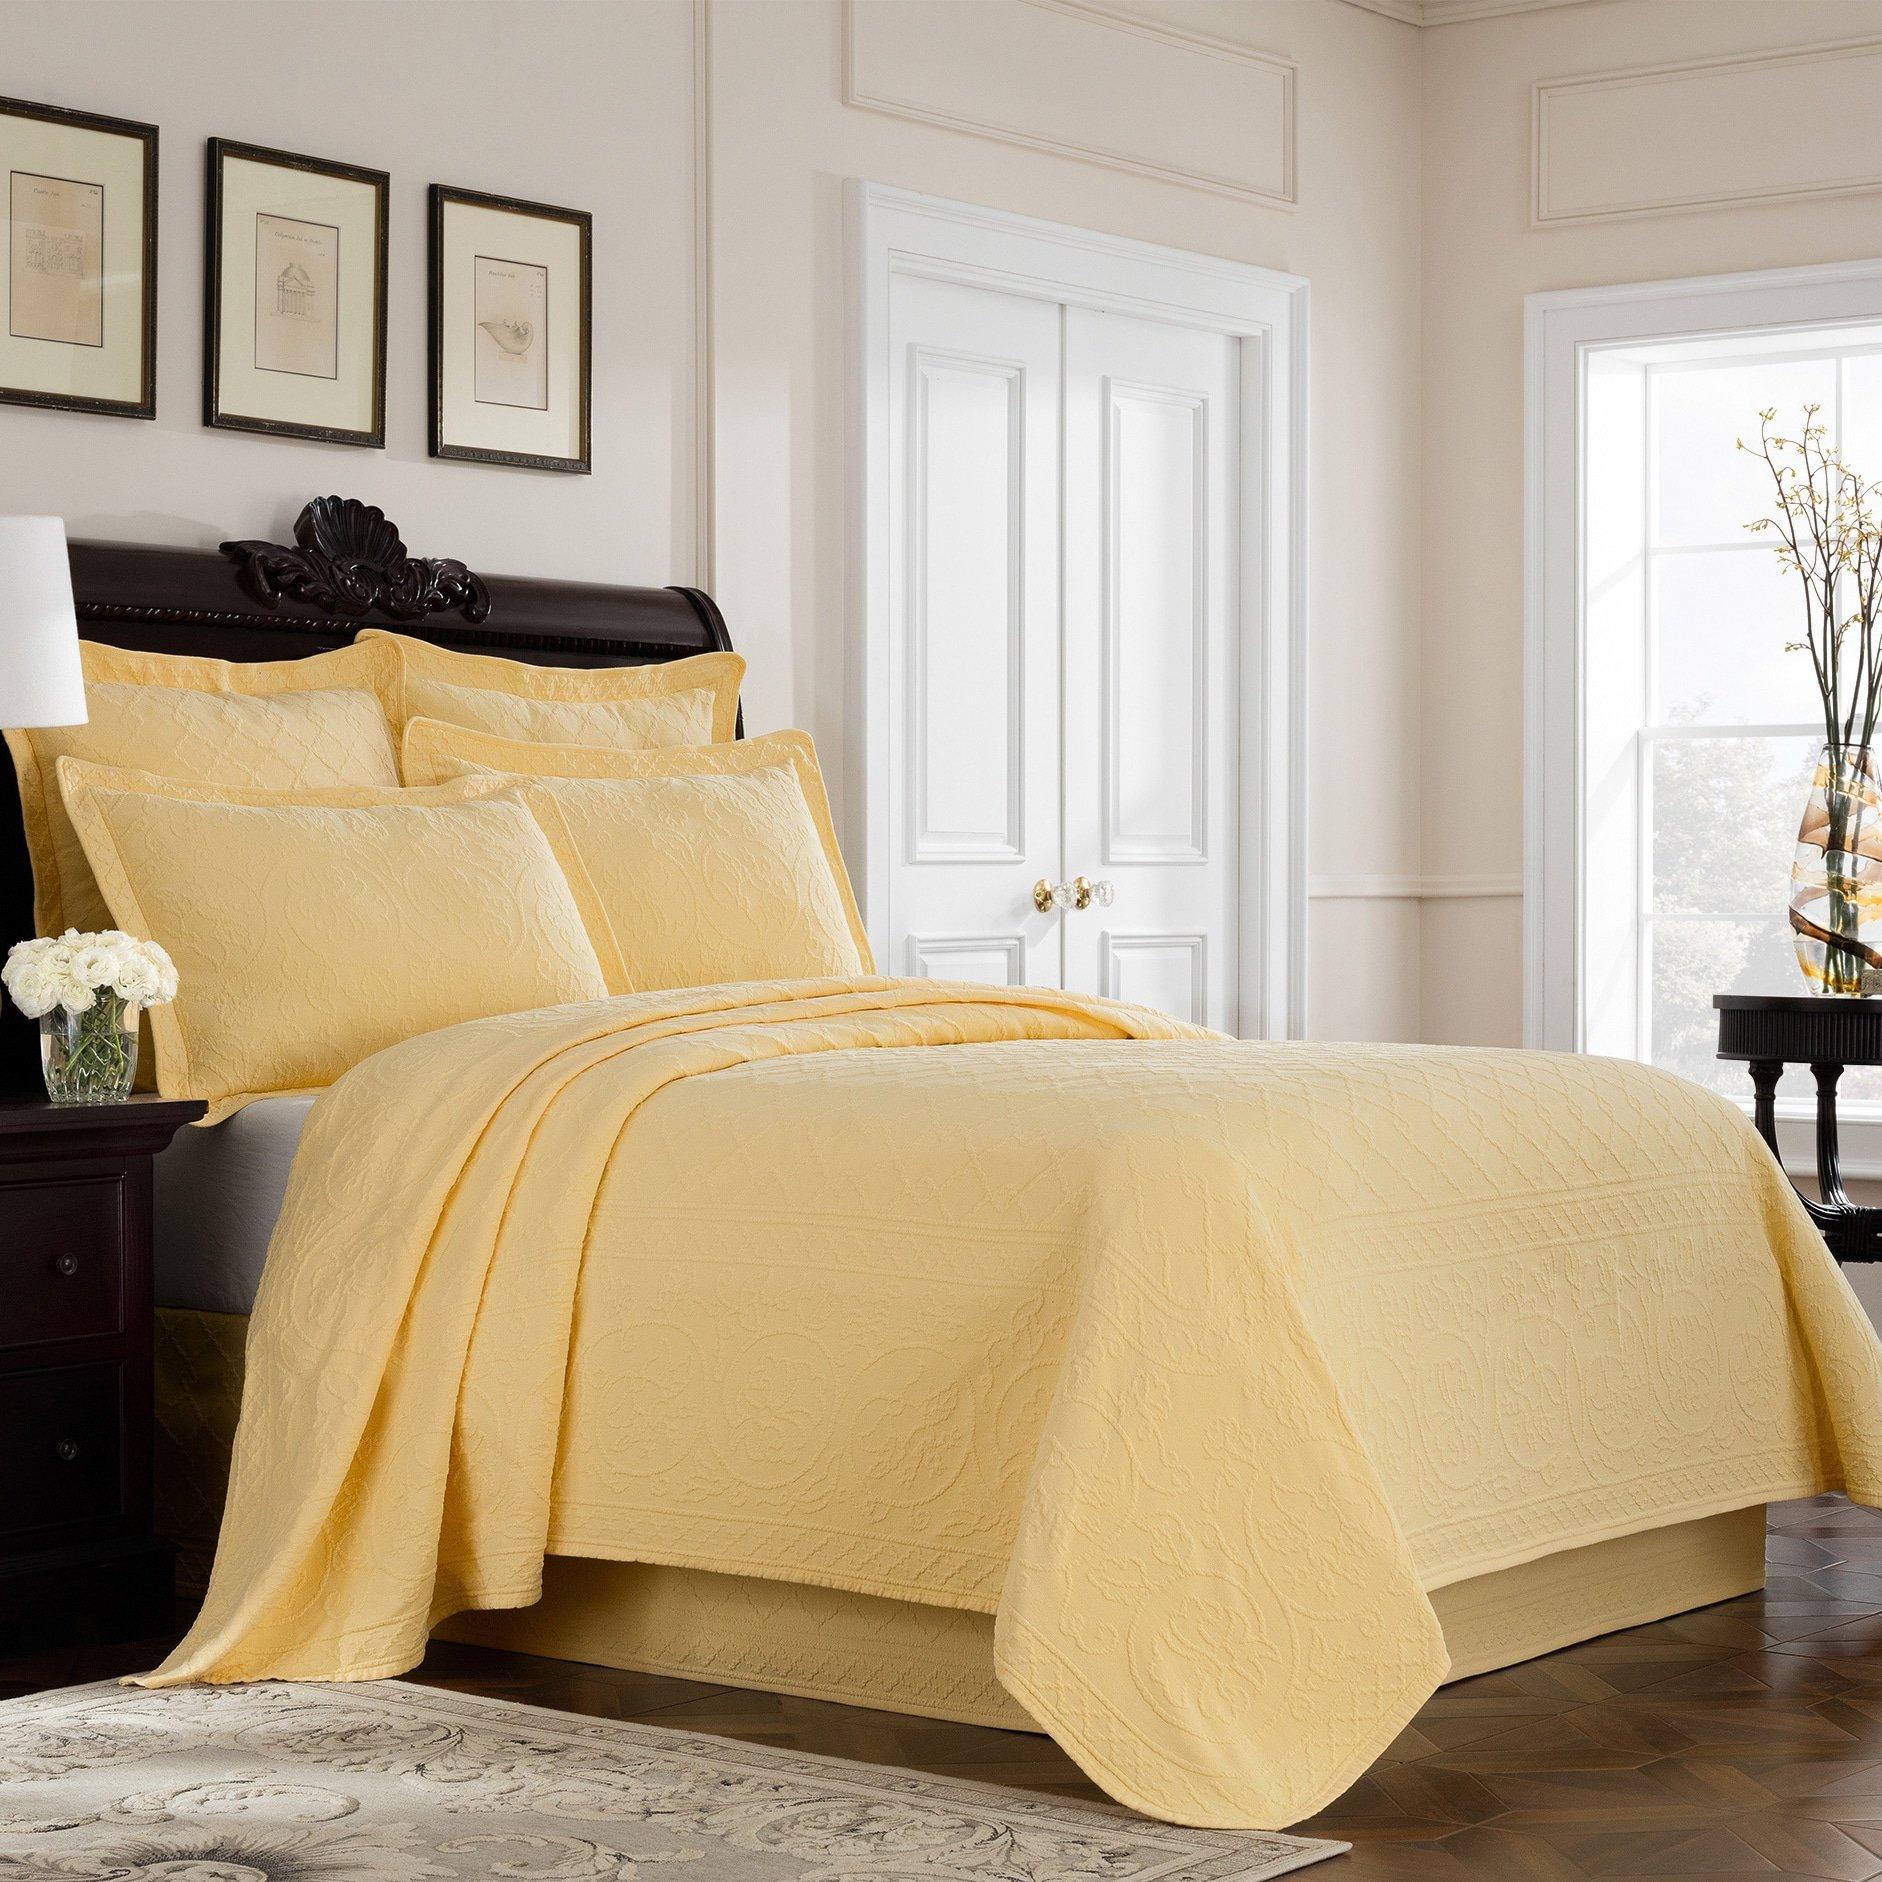 Williamsburg 048975018330 King Richmond Bedskirt - Yellow King Richmond Bedskirt,Yellow